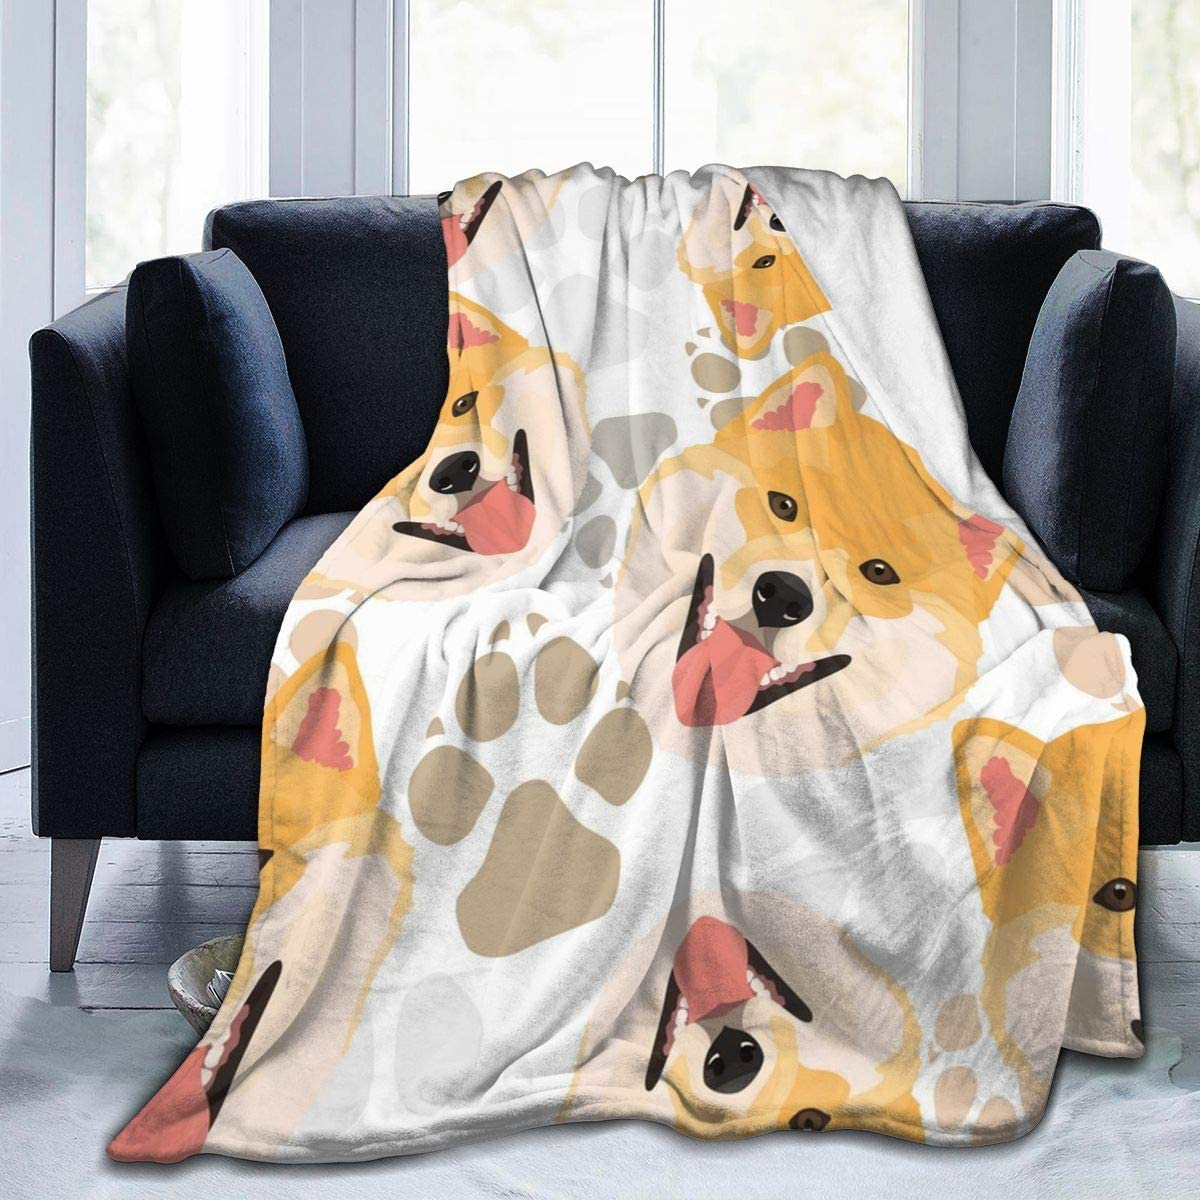 Dog Paws Shiba Inu Ultra Soft Flannel Fleece All Season Light Weight Living Room/Bedroom Warm Blanket